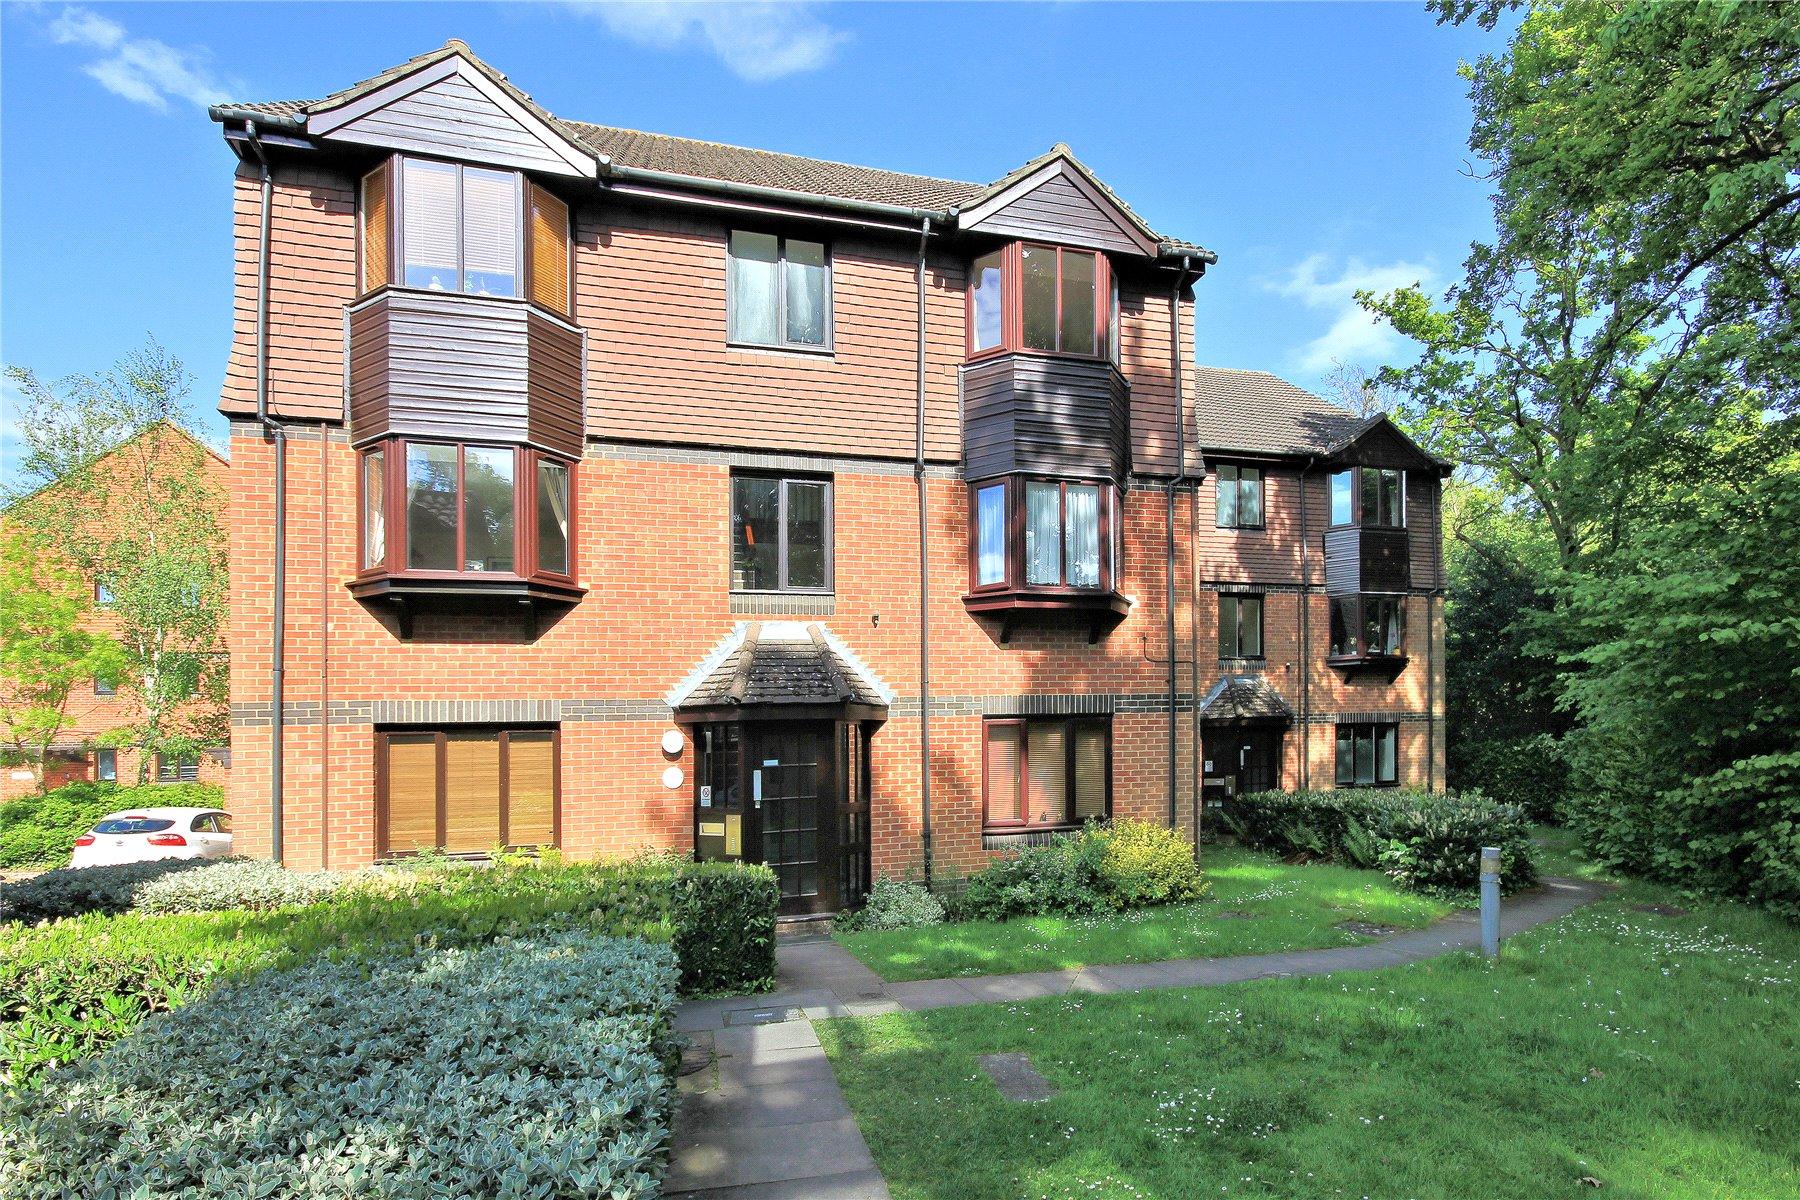 2 Bedrooms Apartment Flat for sale in Foxhills, Woking, Surrey, GU21